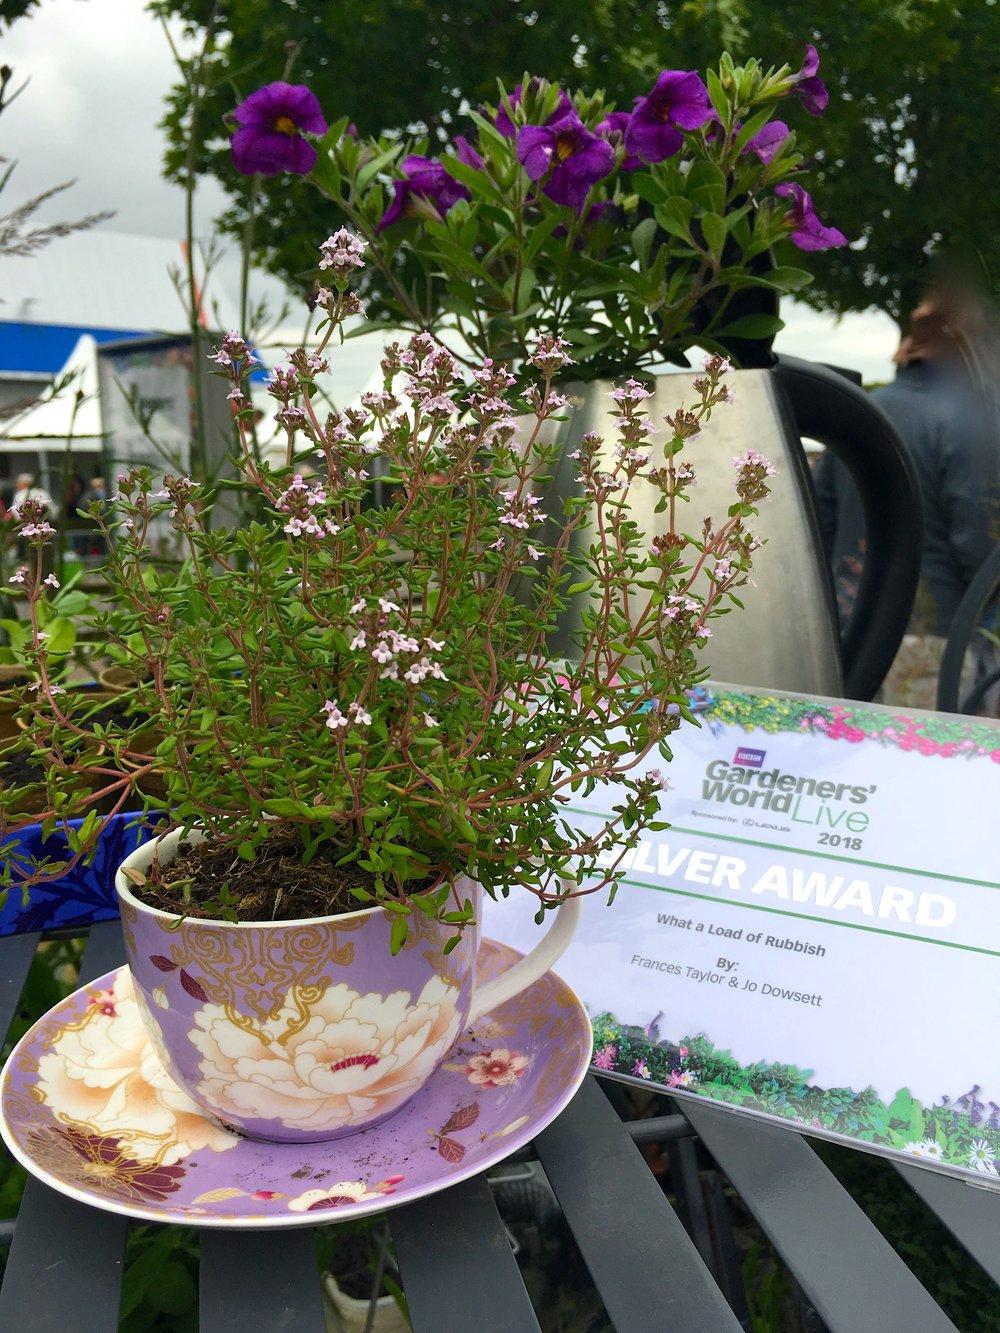 A purple cup of herb tea